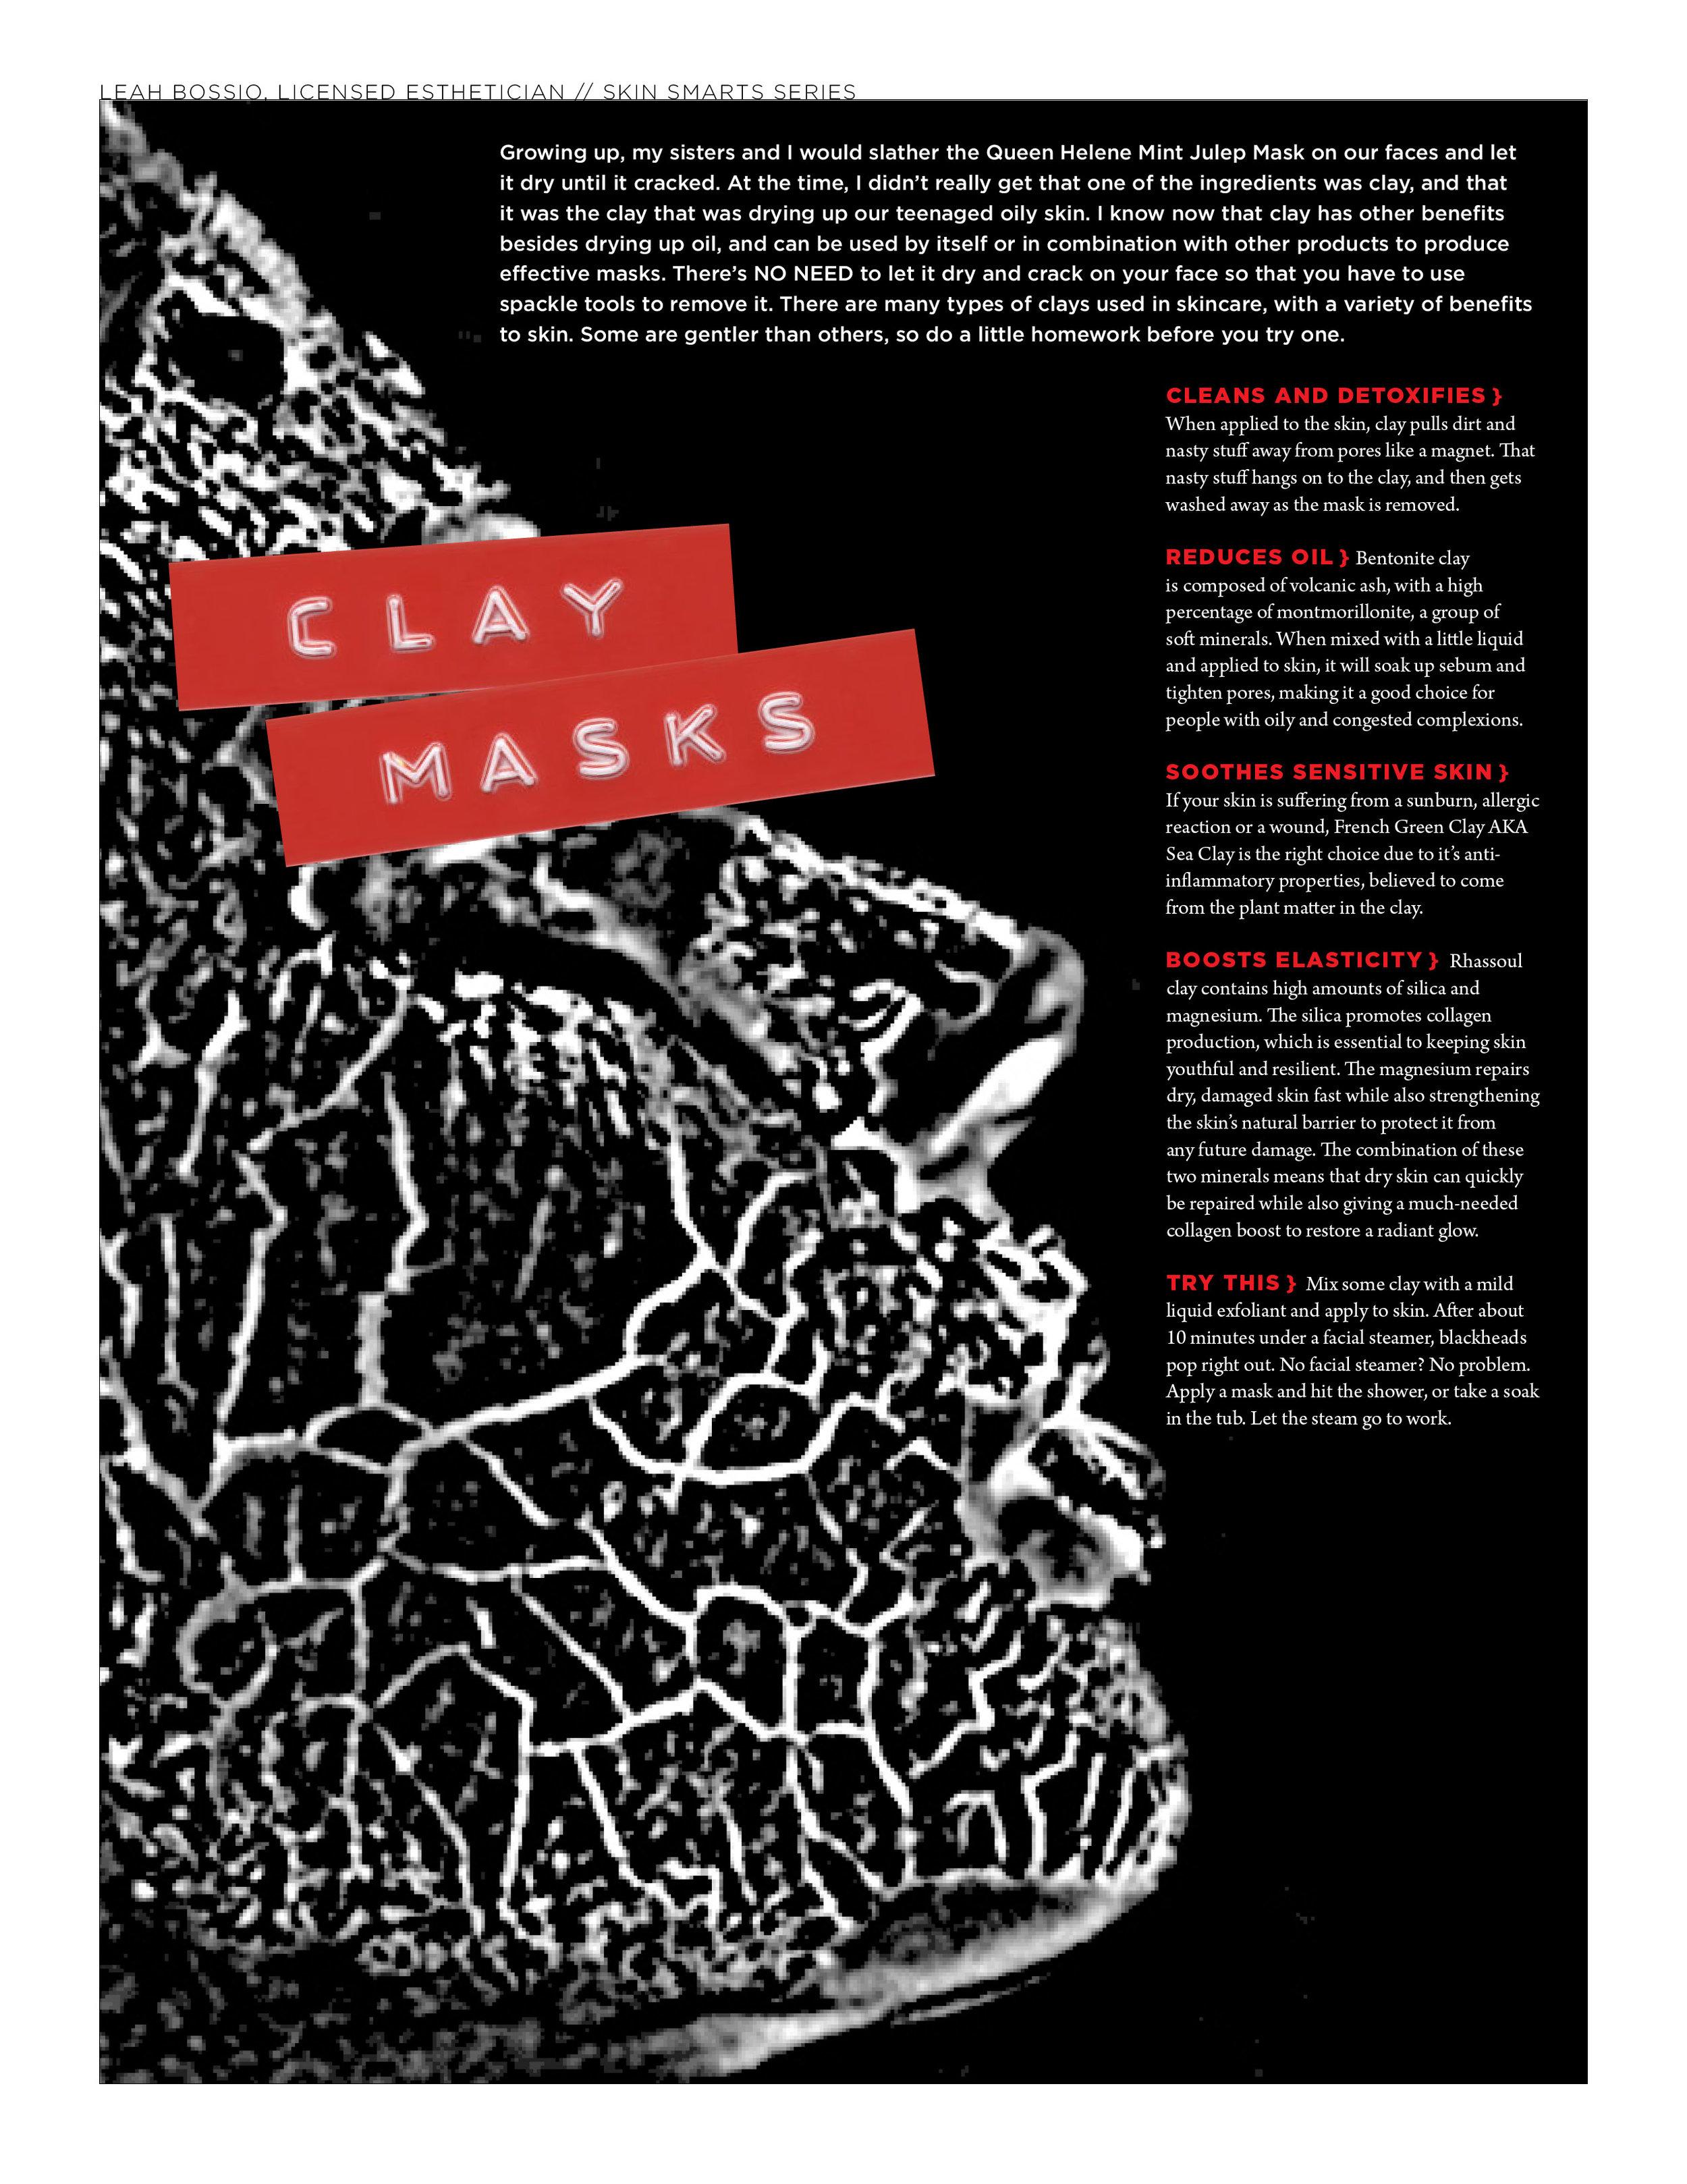 skinsmarts.clay.jpg